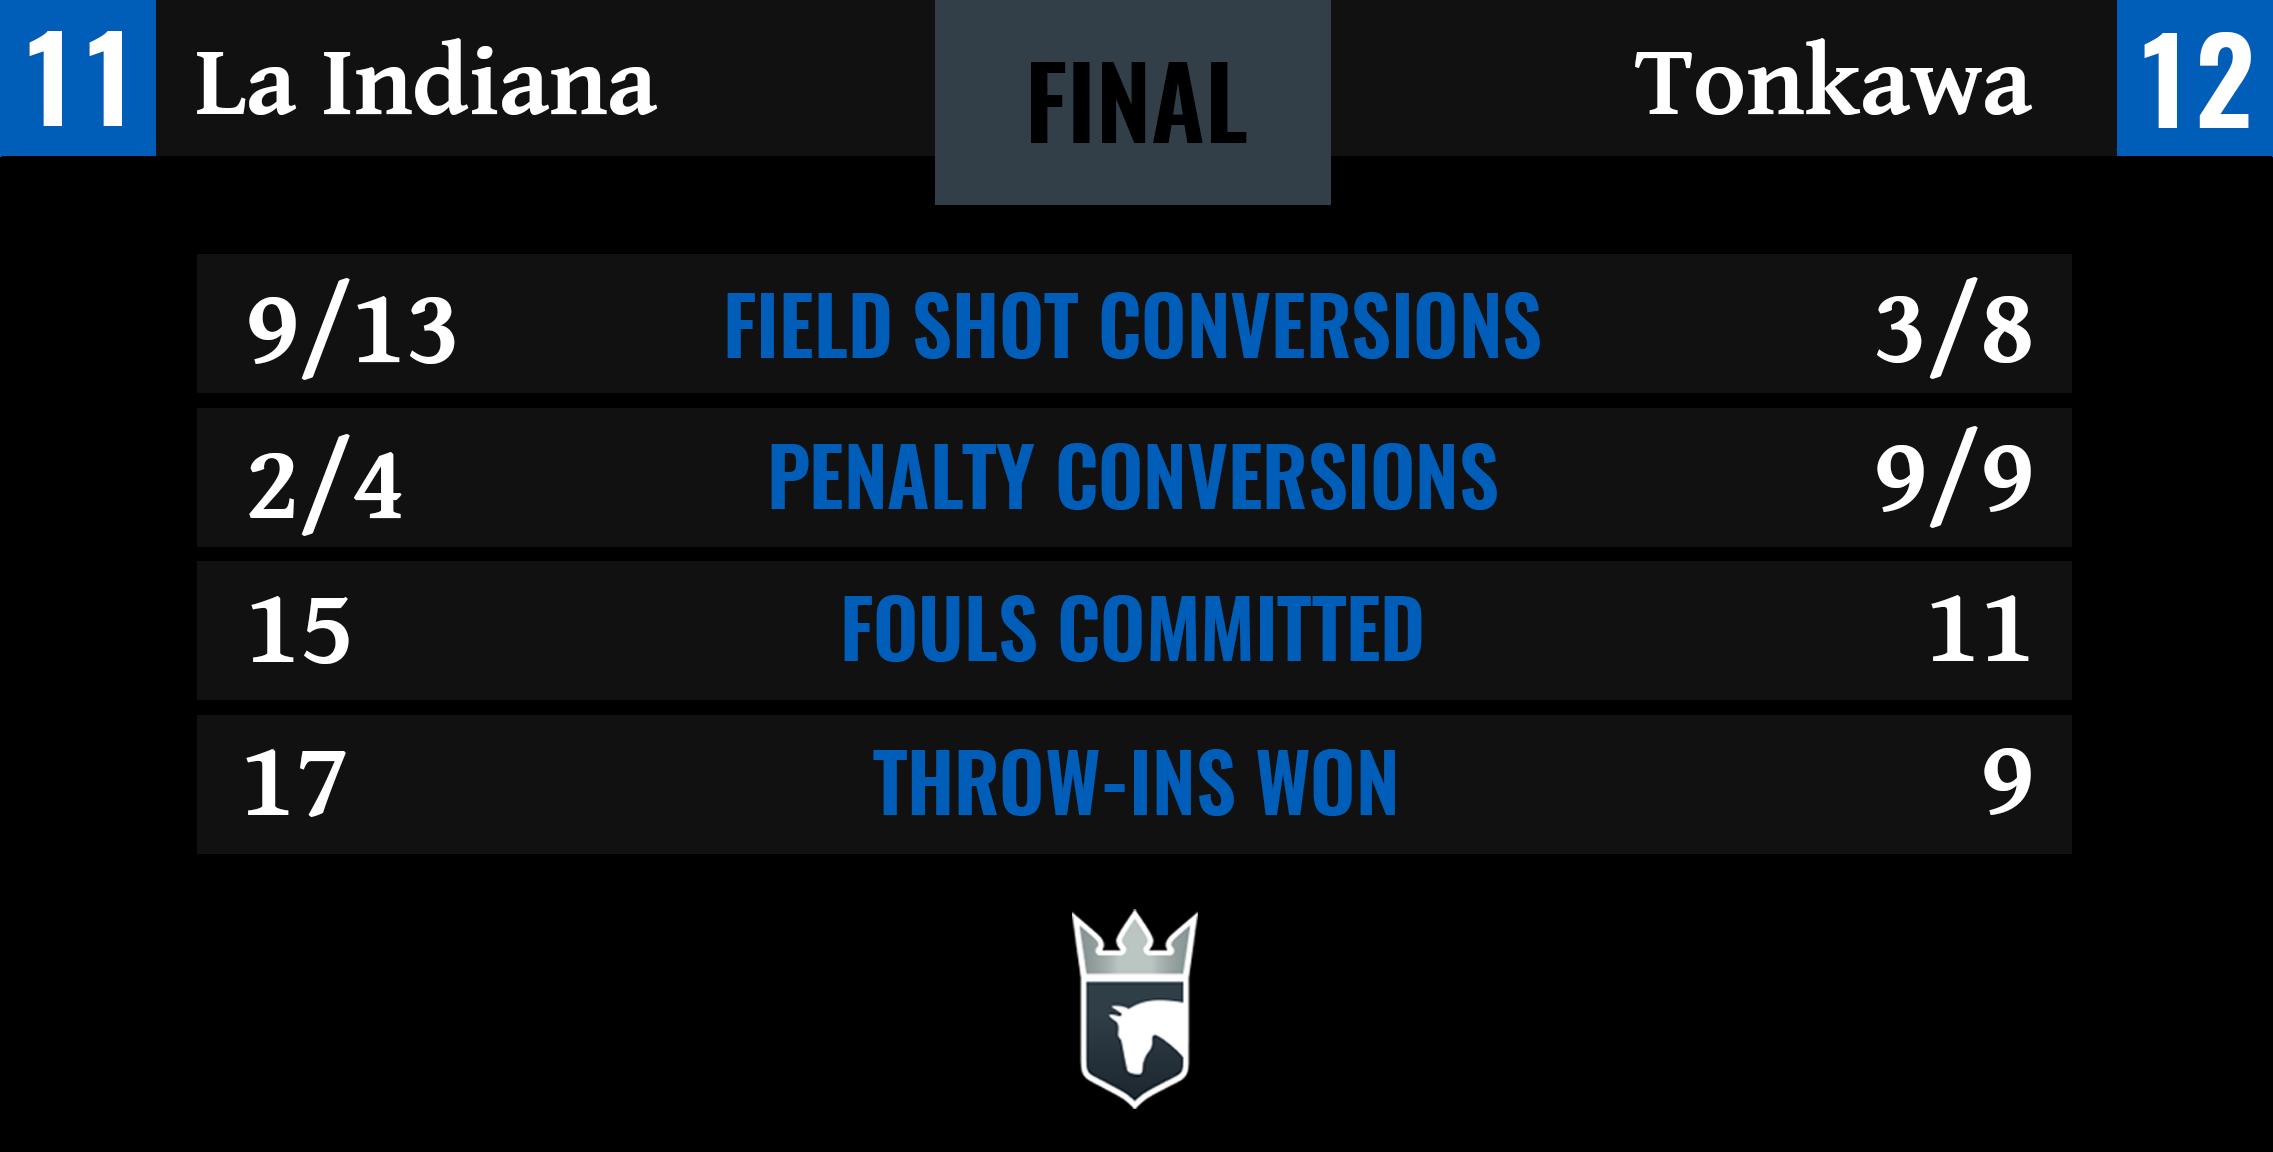 La Indiana vs Tonkawa Final Stats